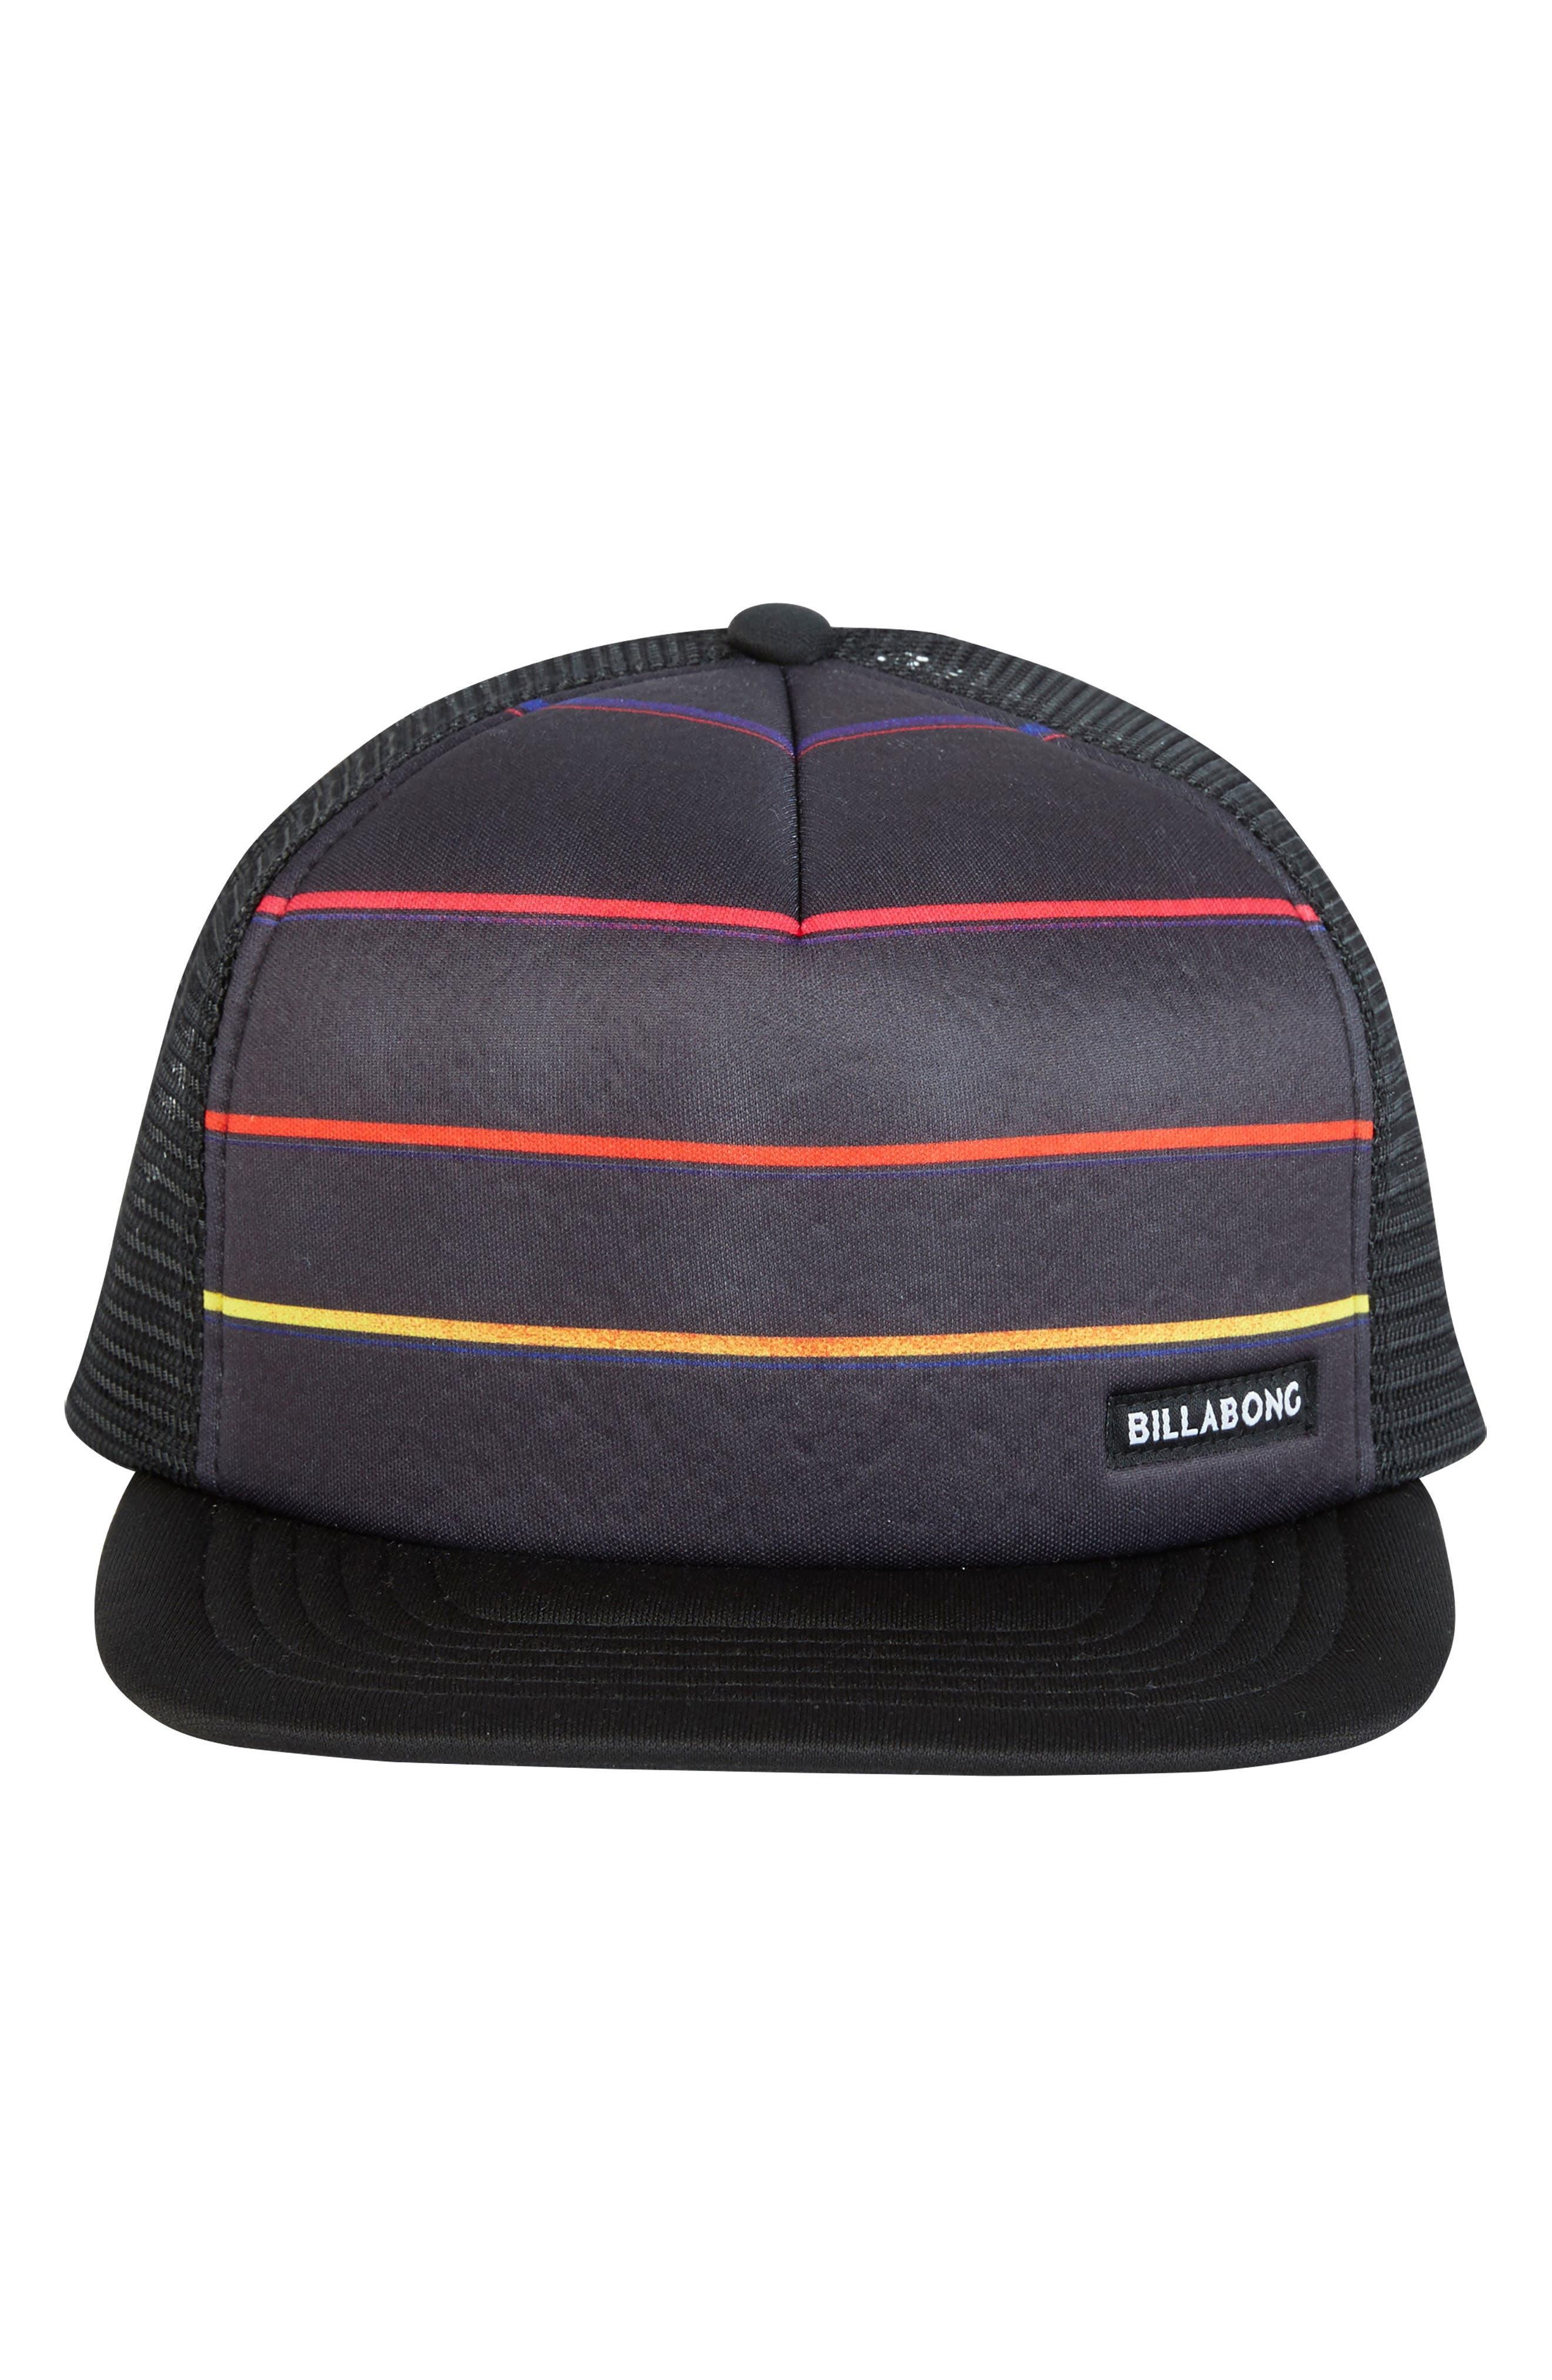 73 Snapback Trucker Hat,                             Alternate thumbnail 2, color,                             001